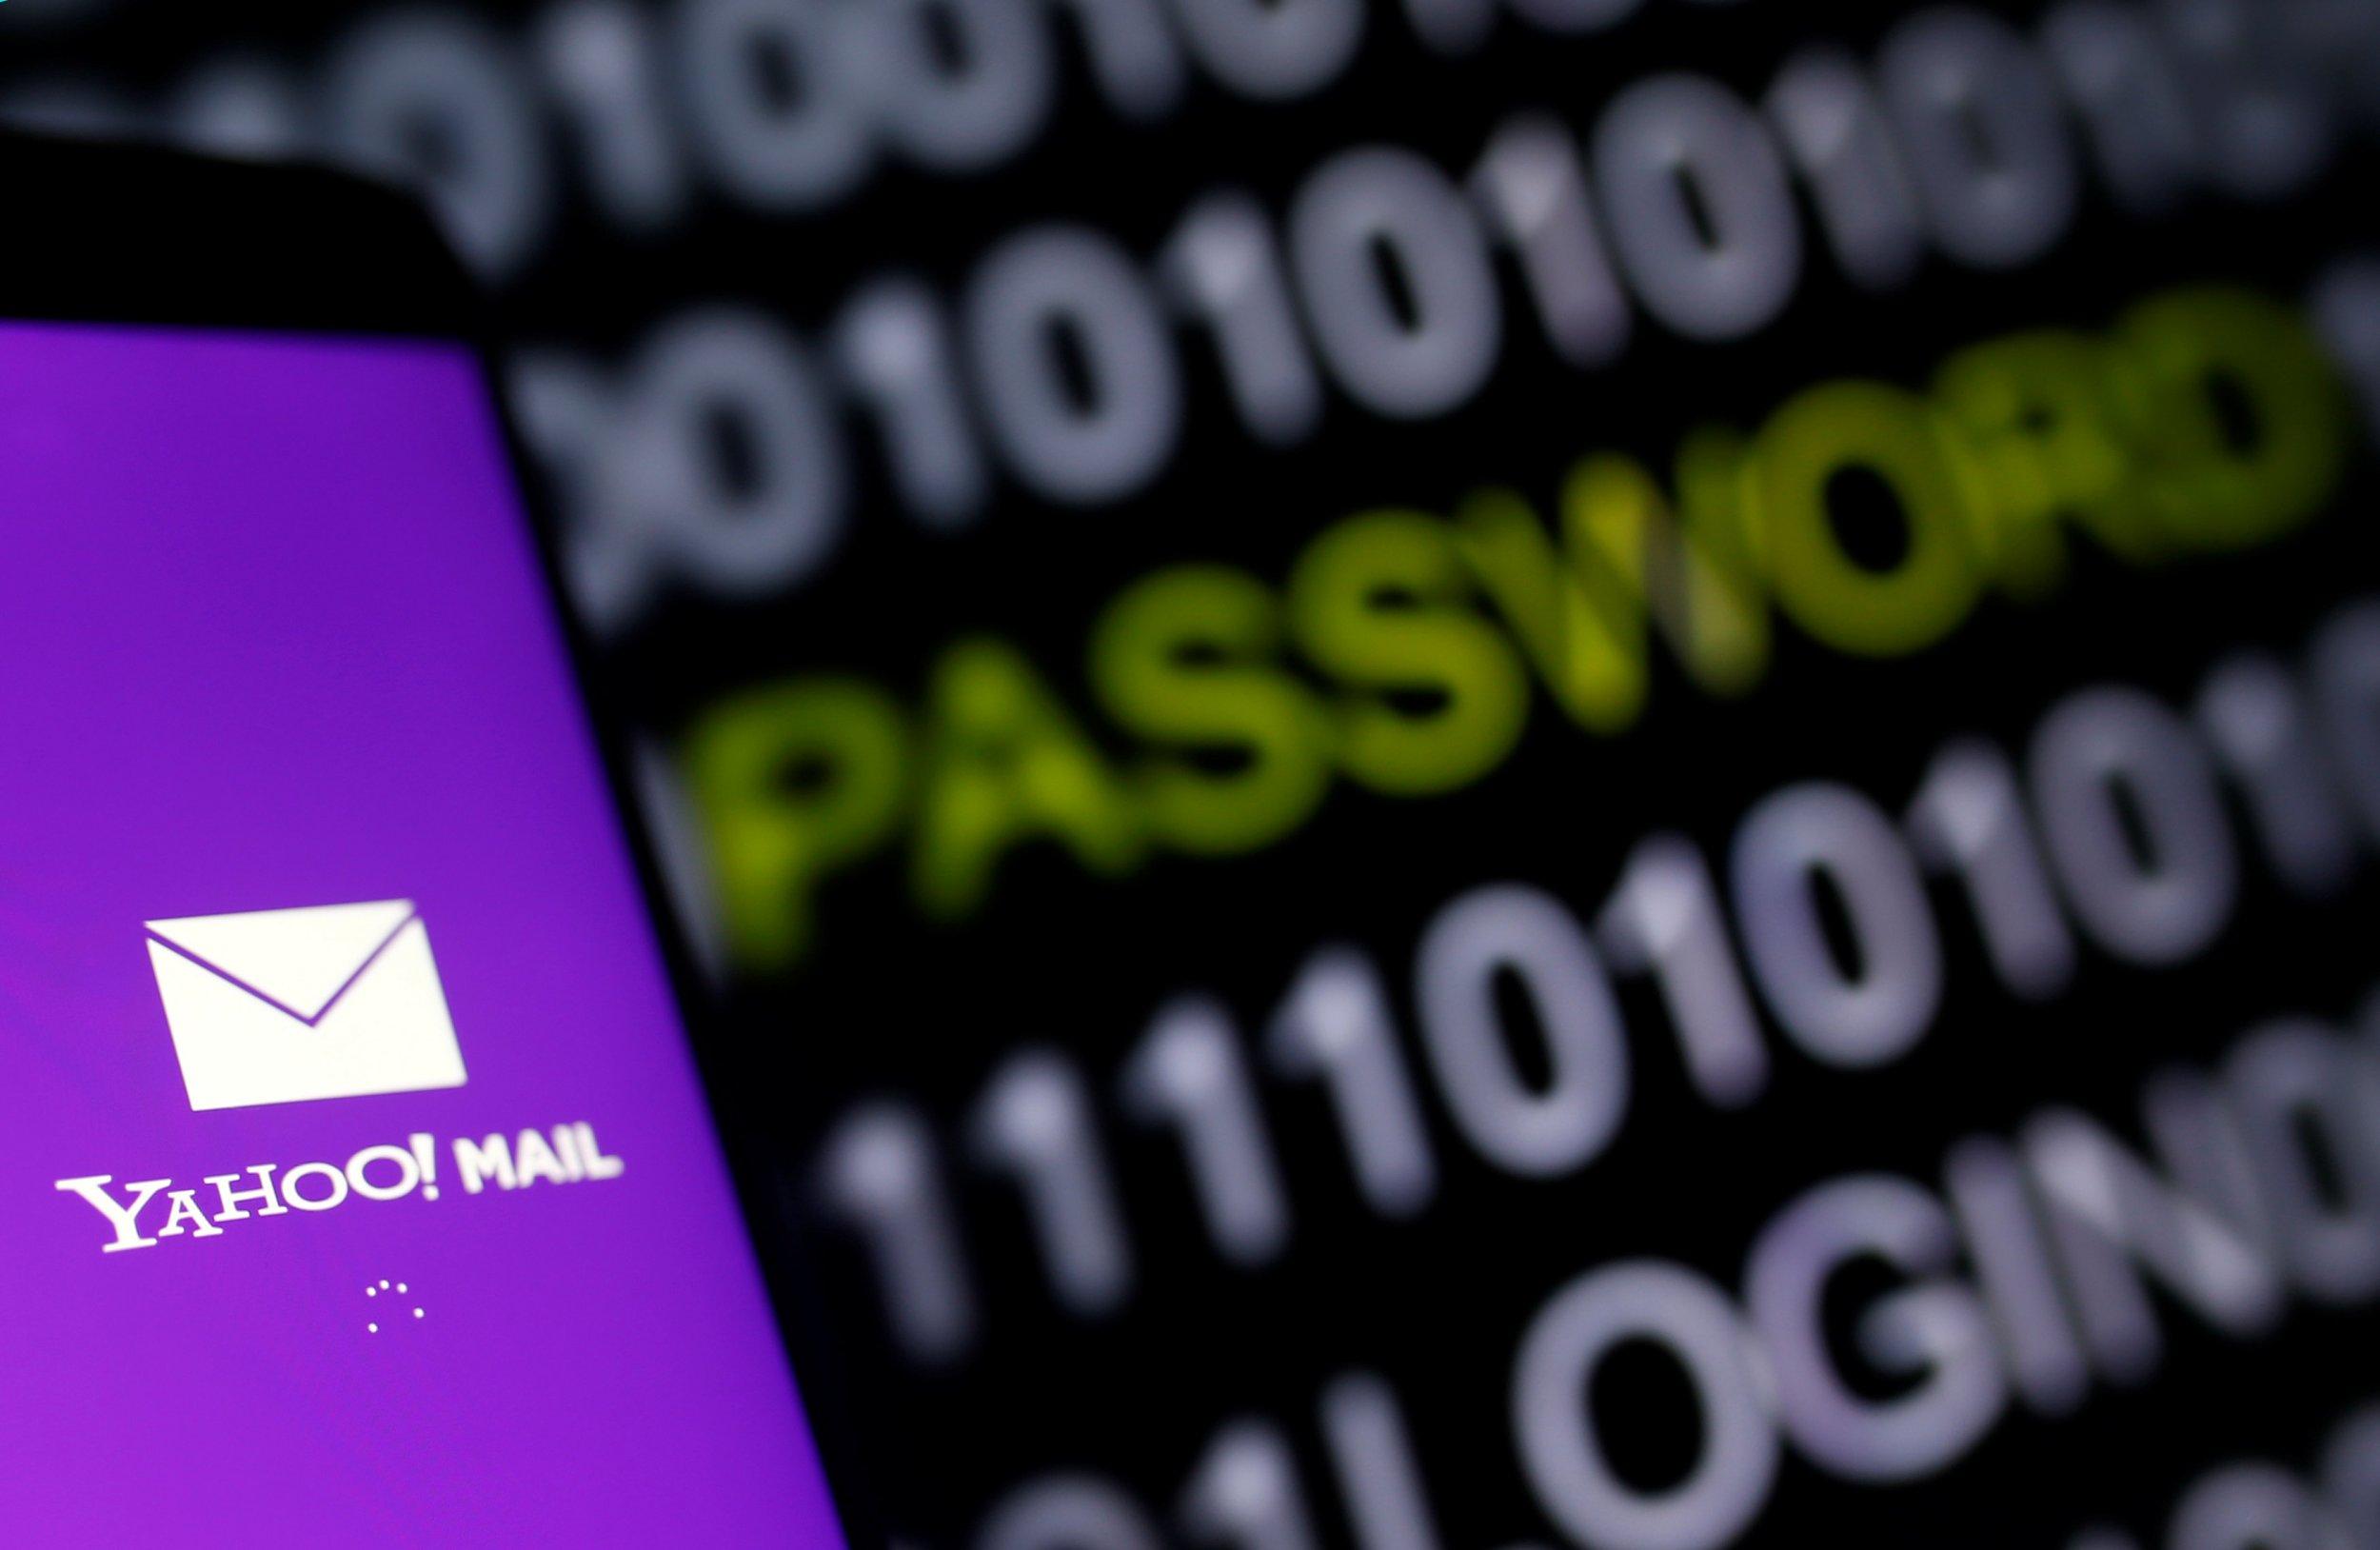 10_08_Yahoo_Surveillance_01